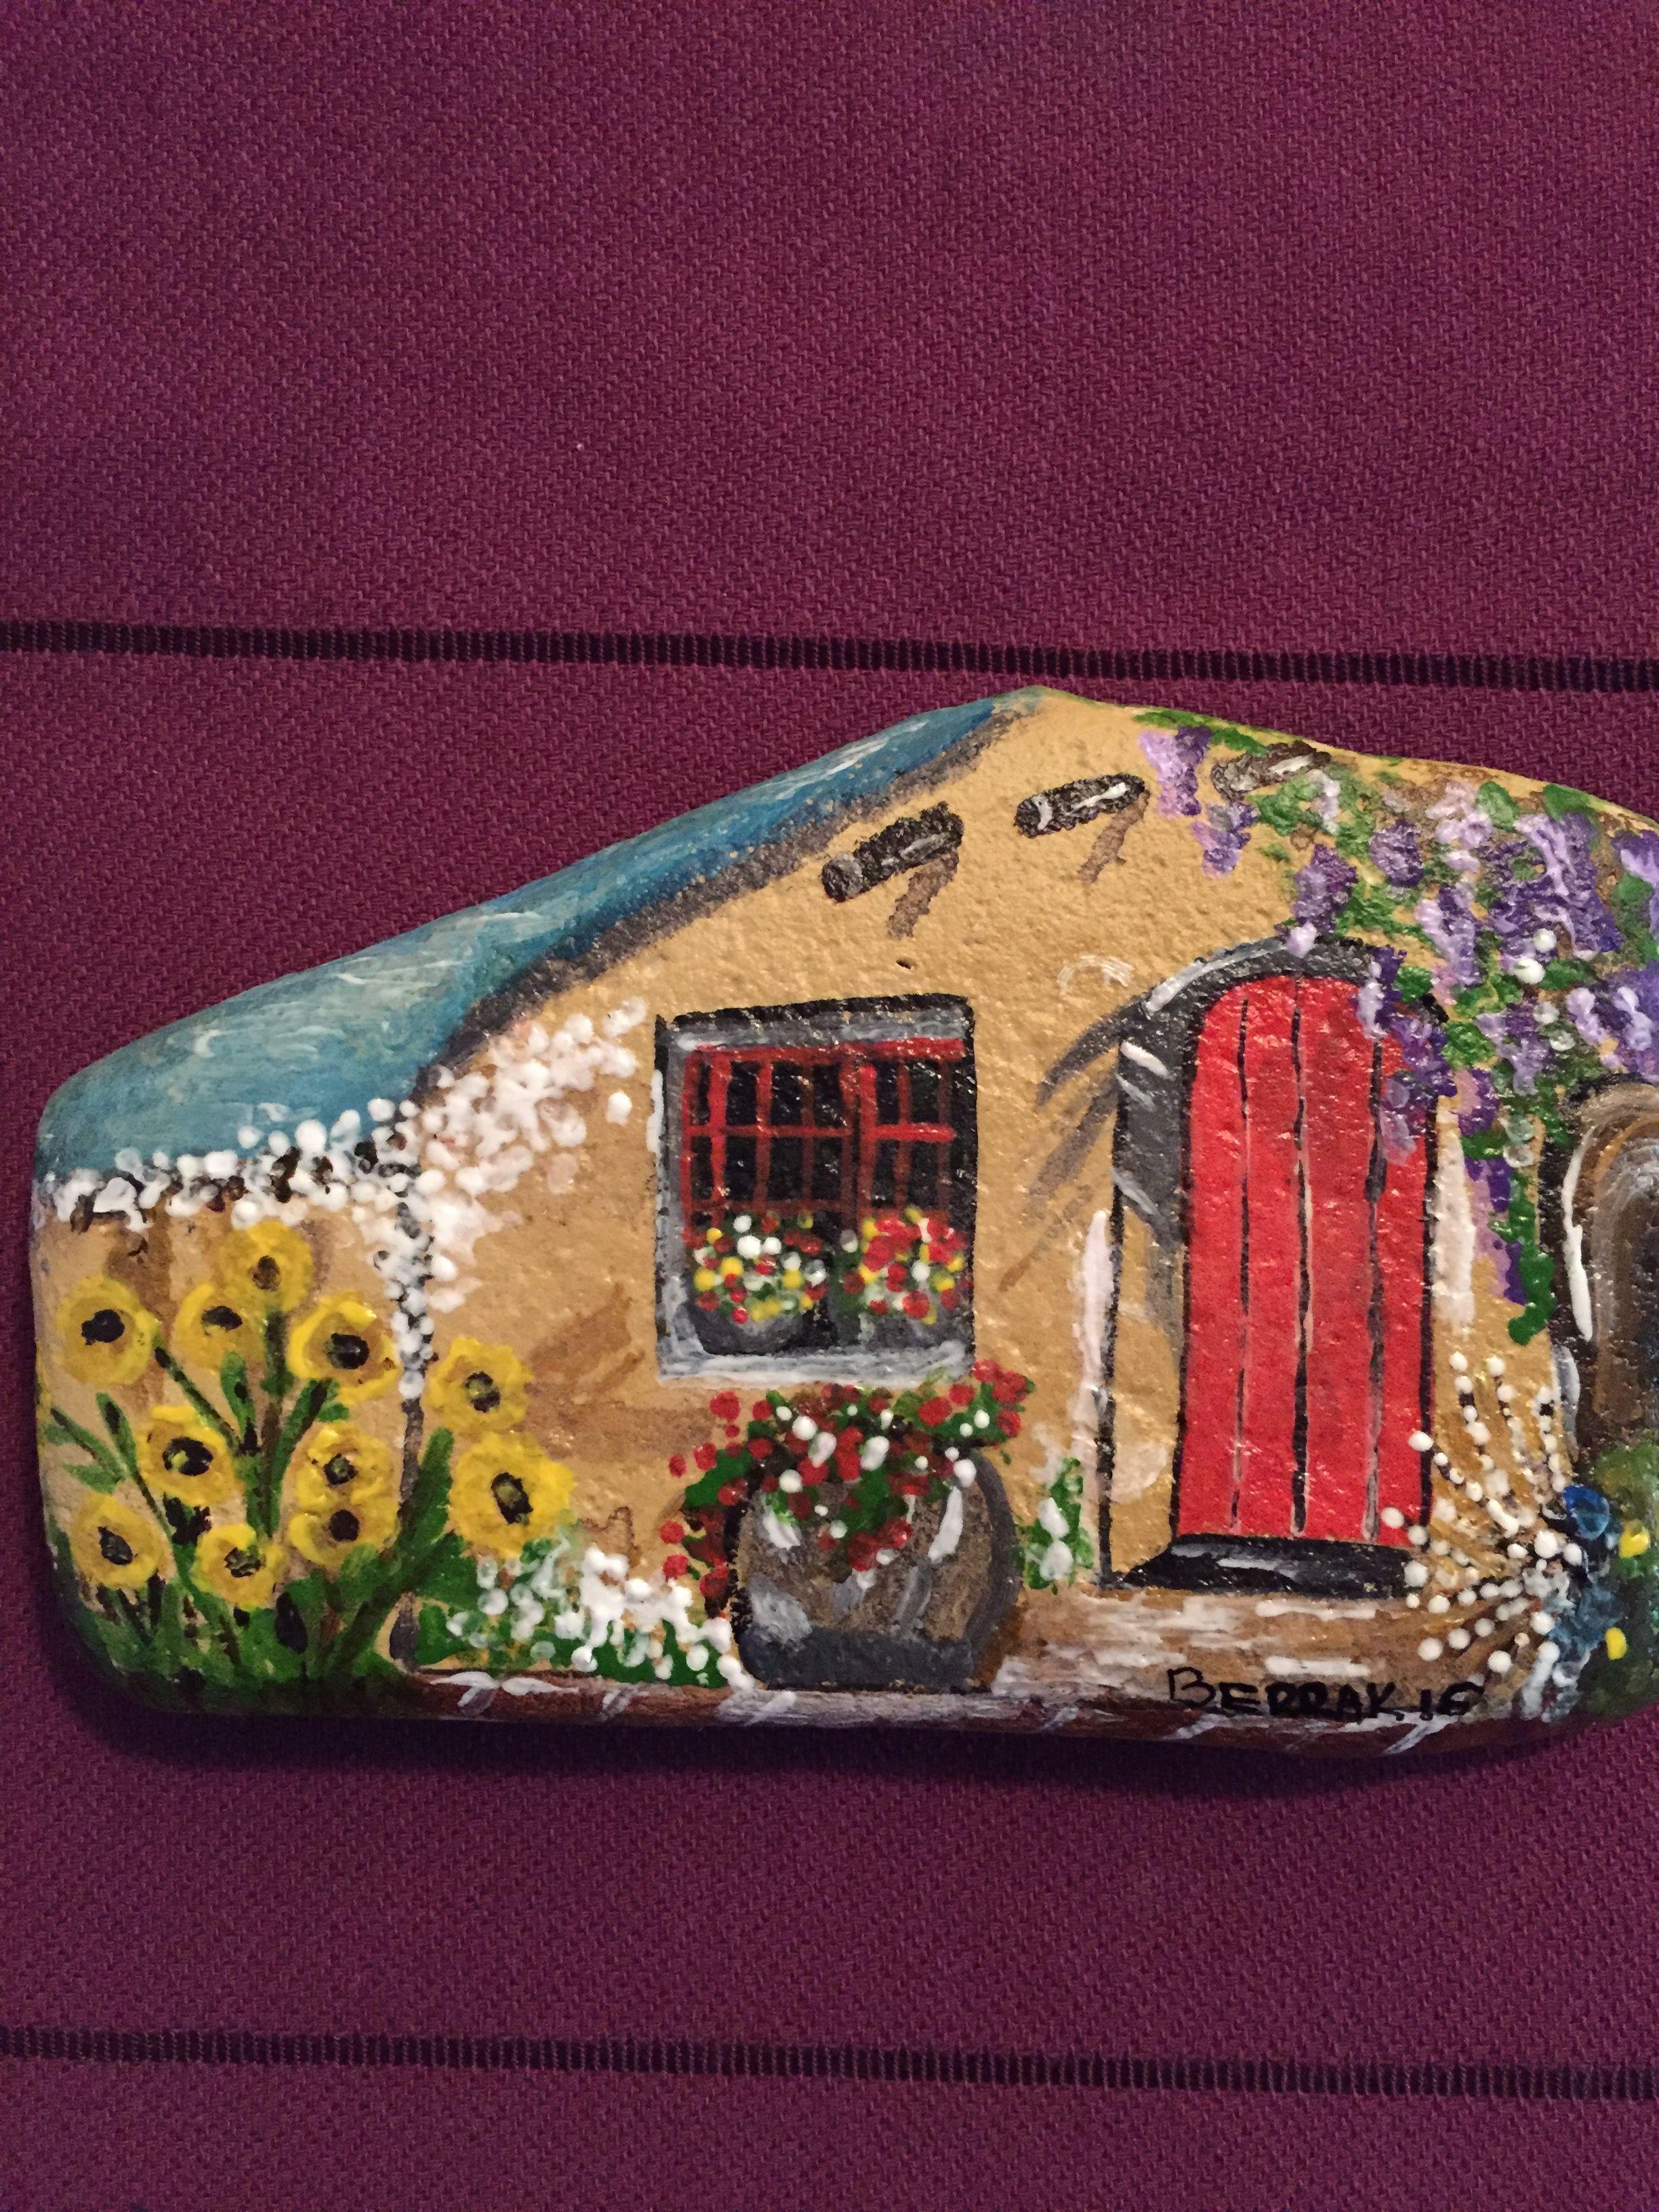 Pretty flowery cottage!